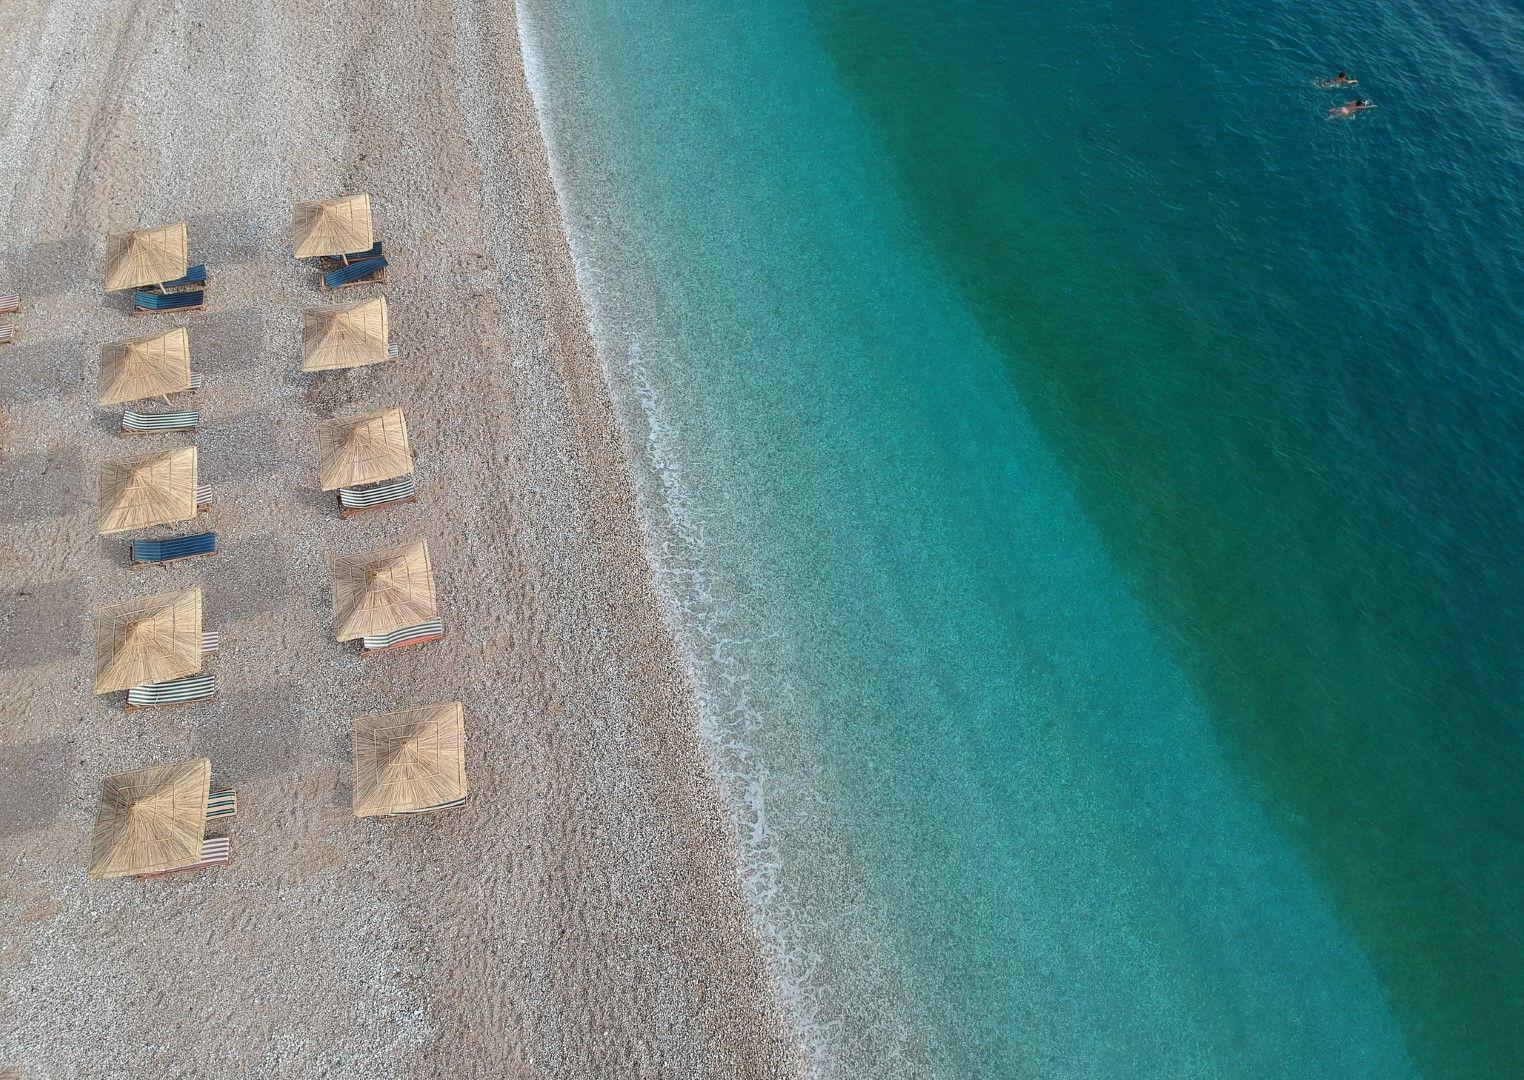 Плаж Потами край Химара, Албания